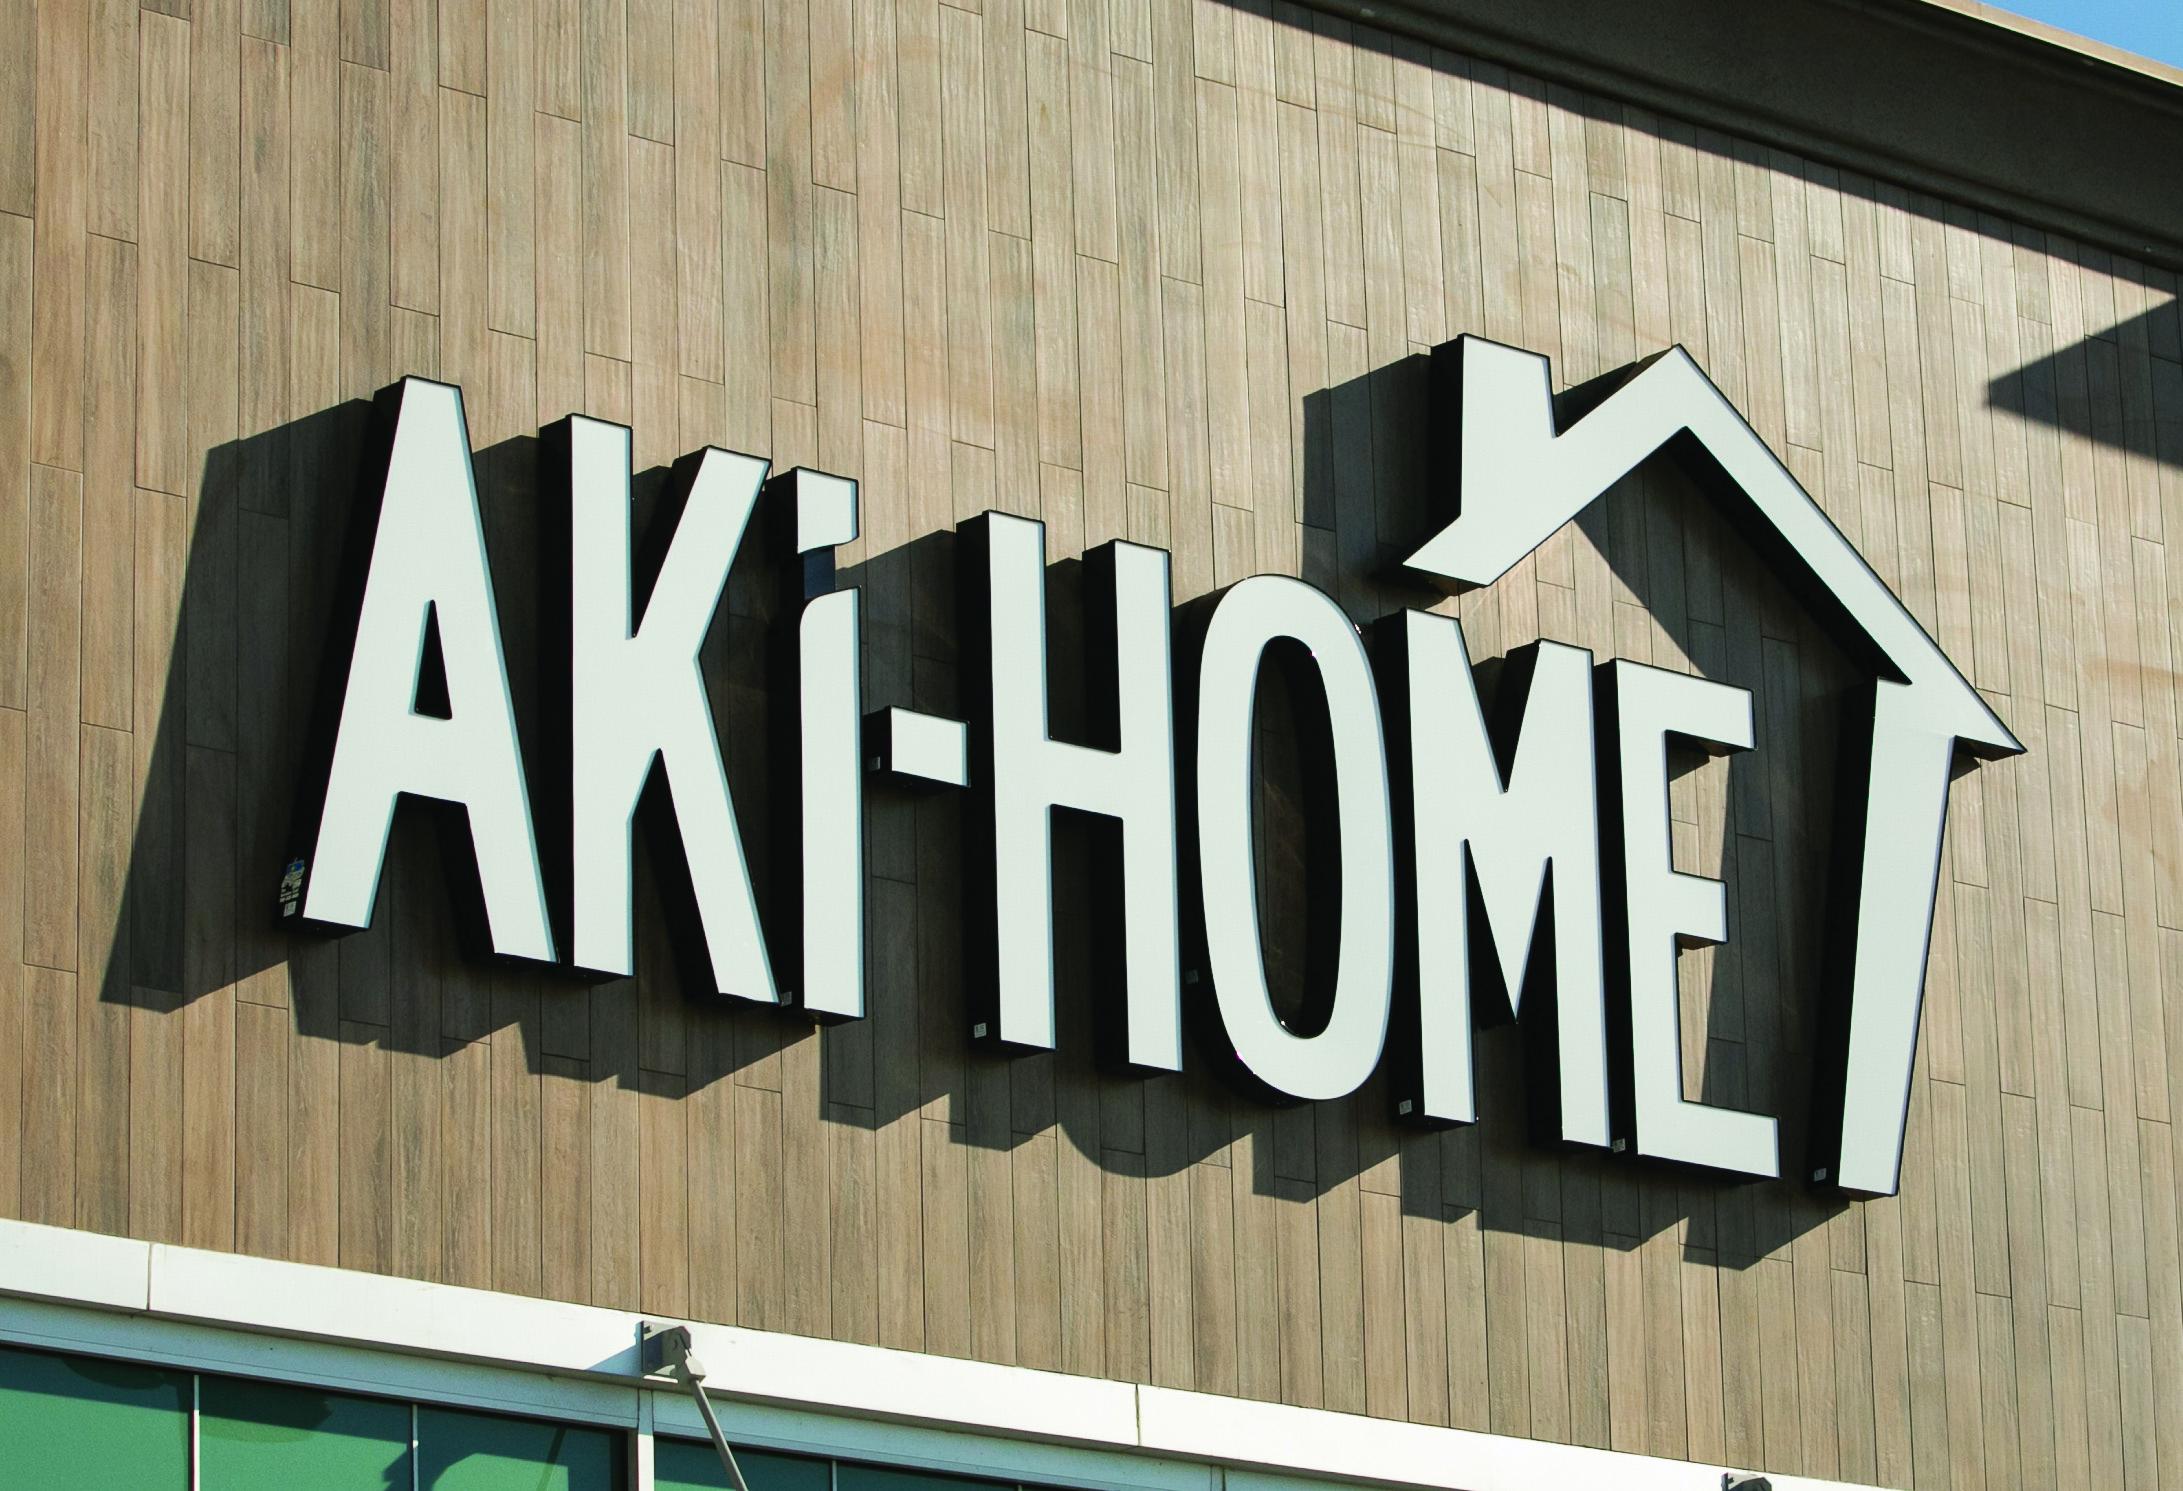 aki home california s new home furnishings retailer expands into